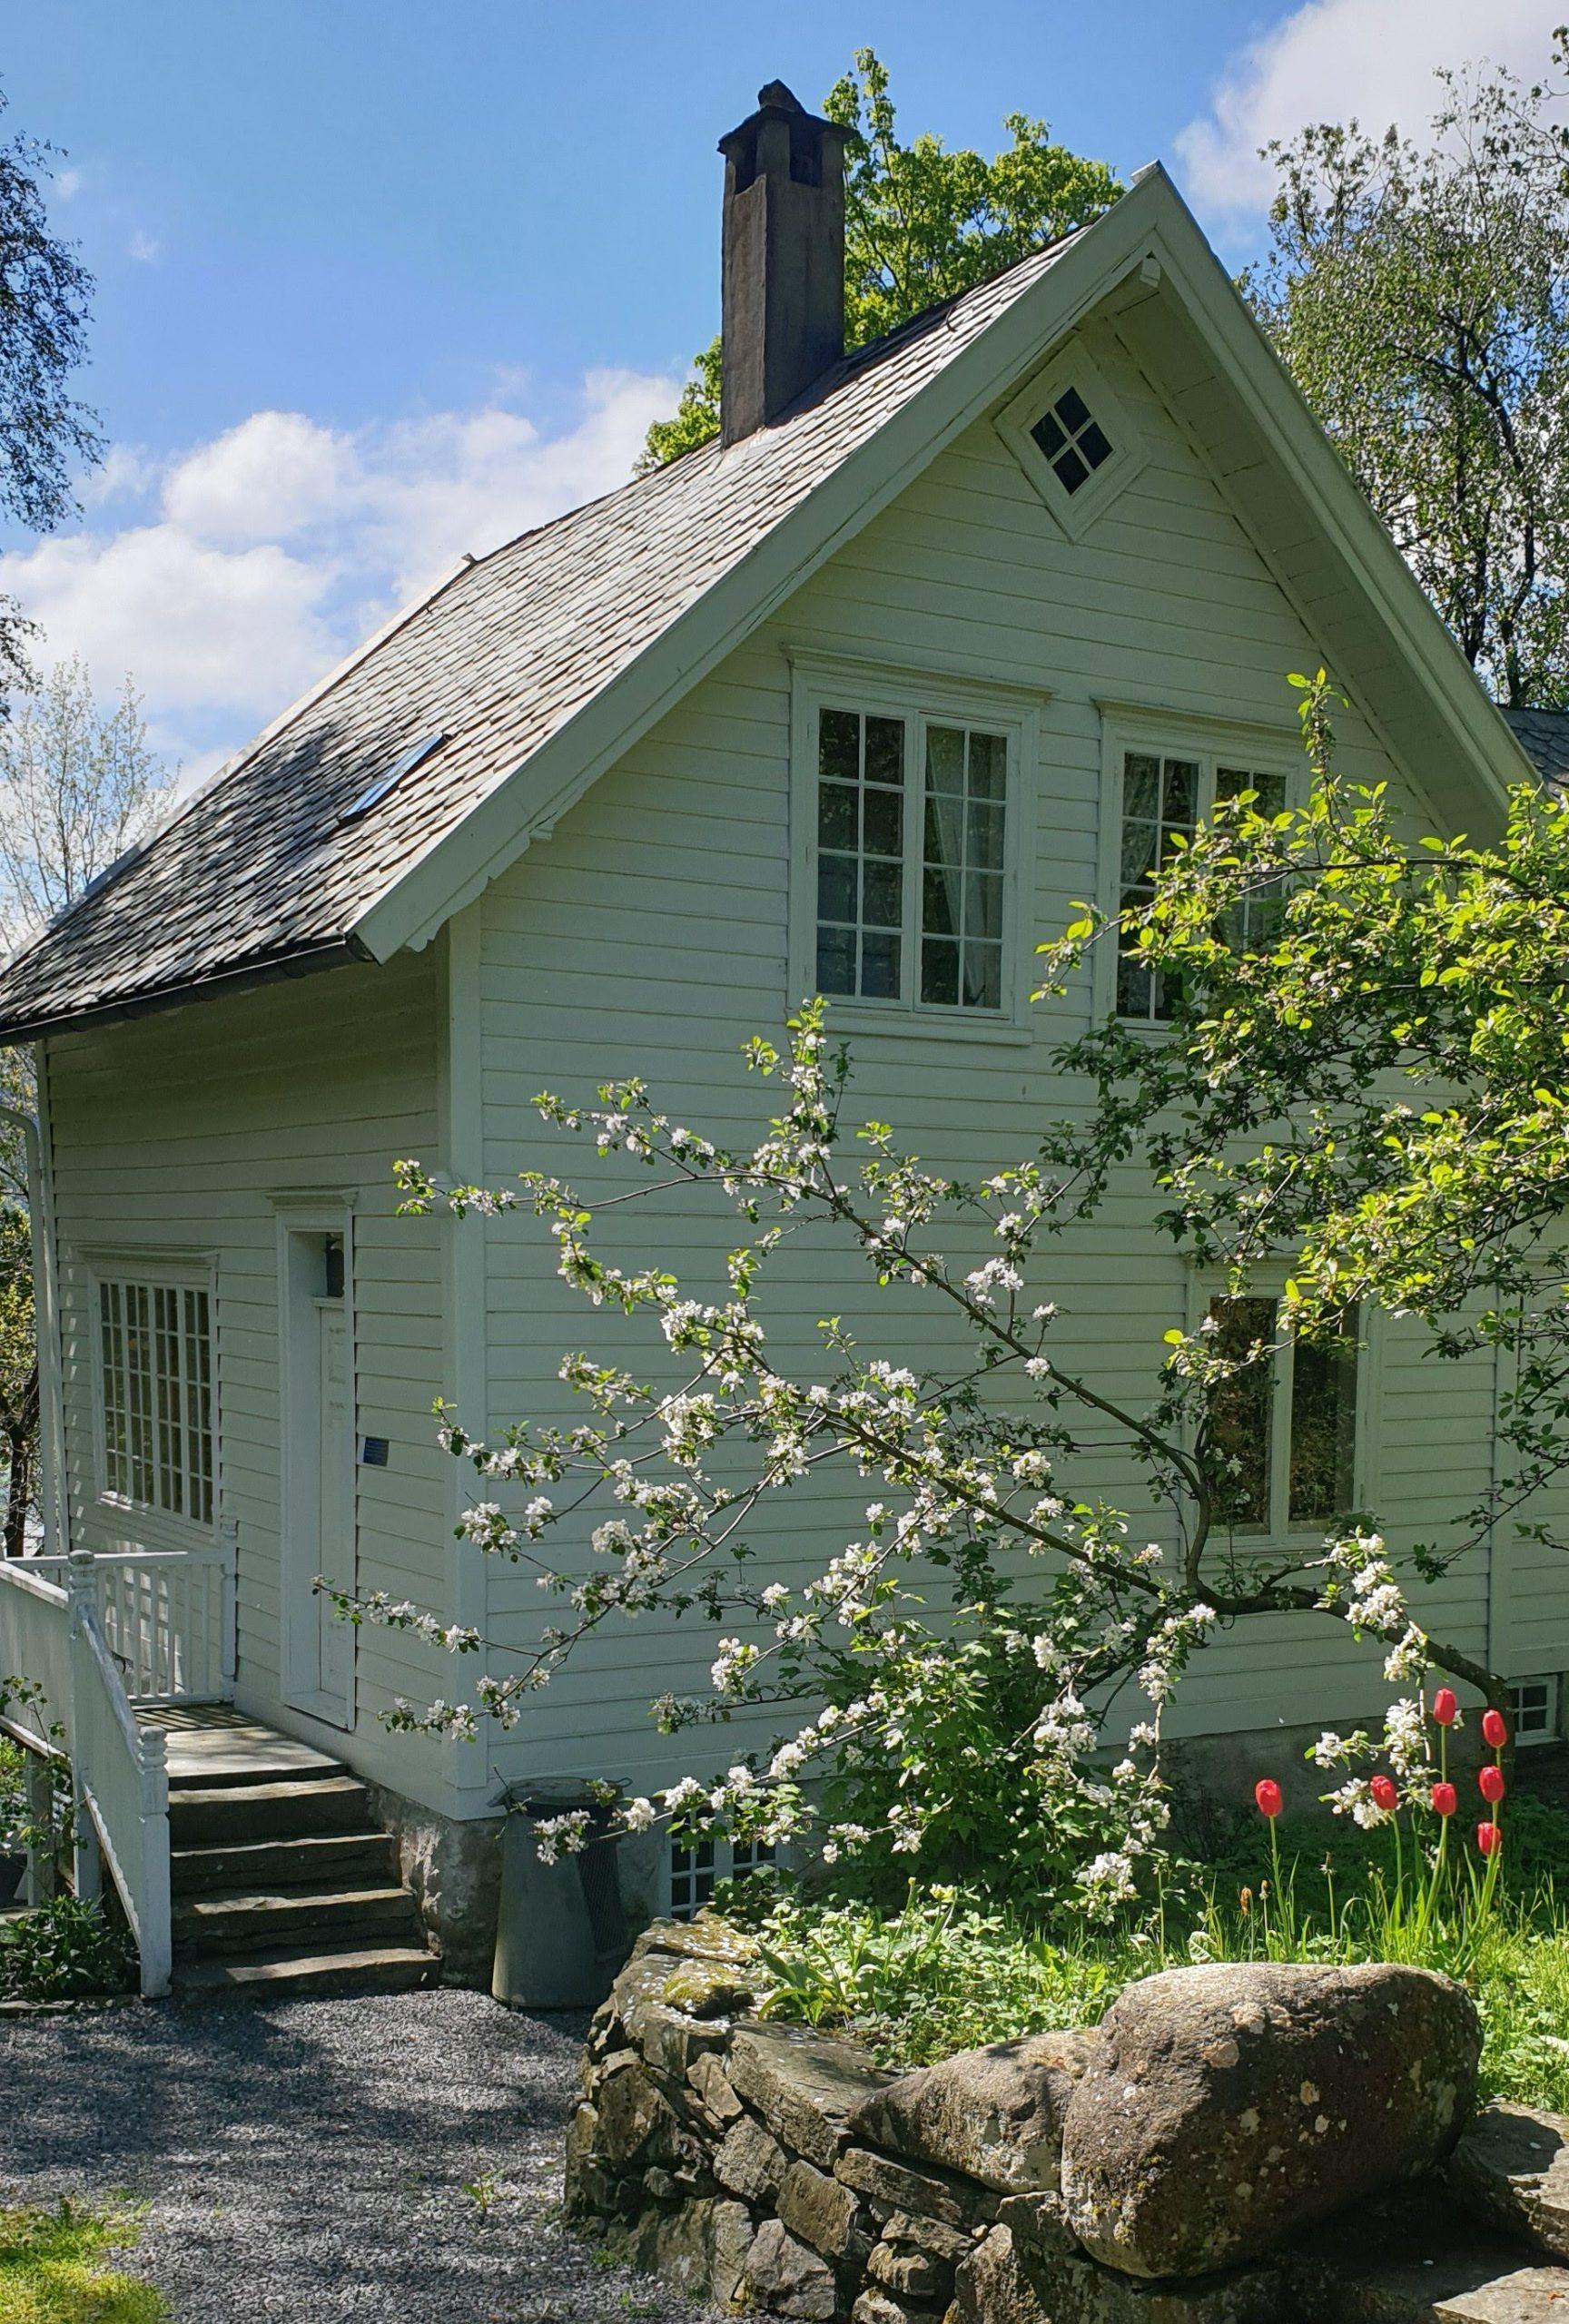 House of Ambrosia